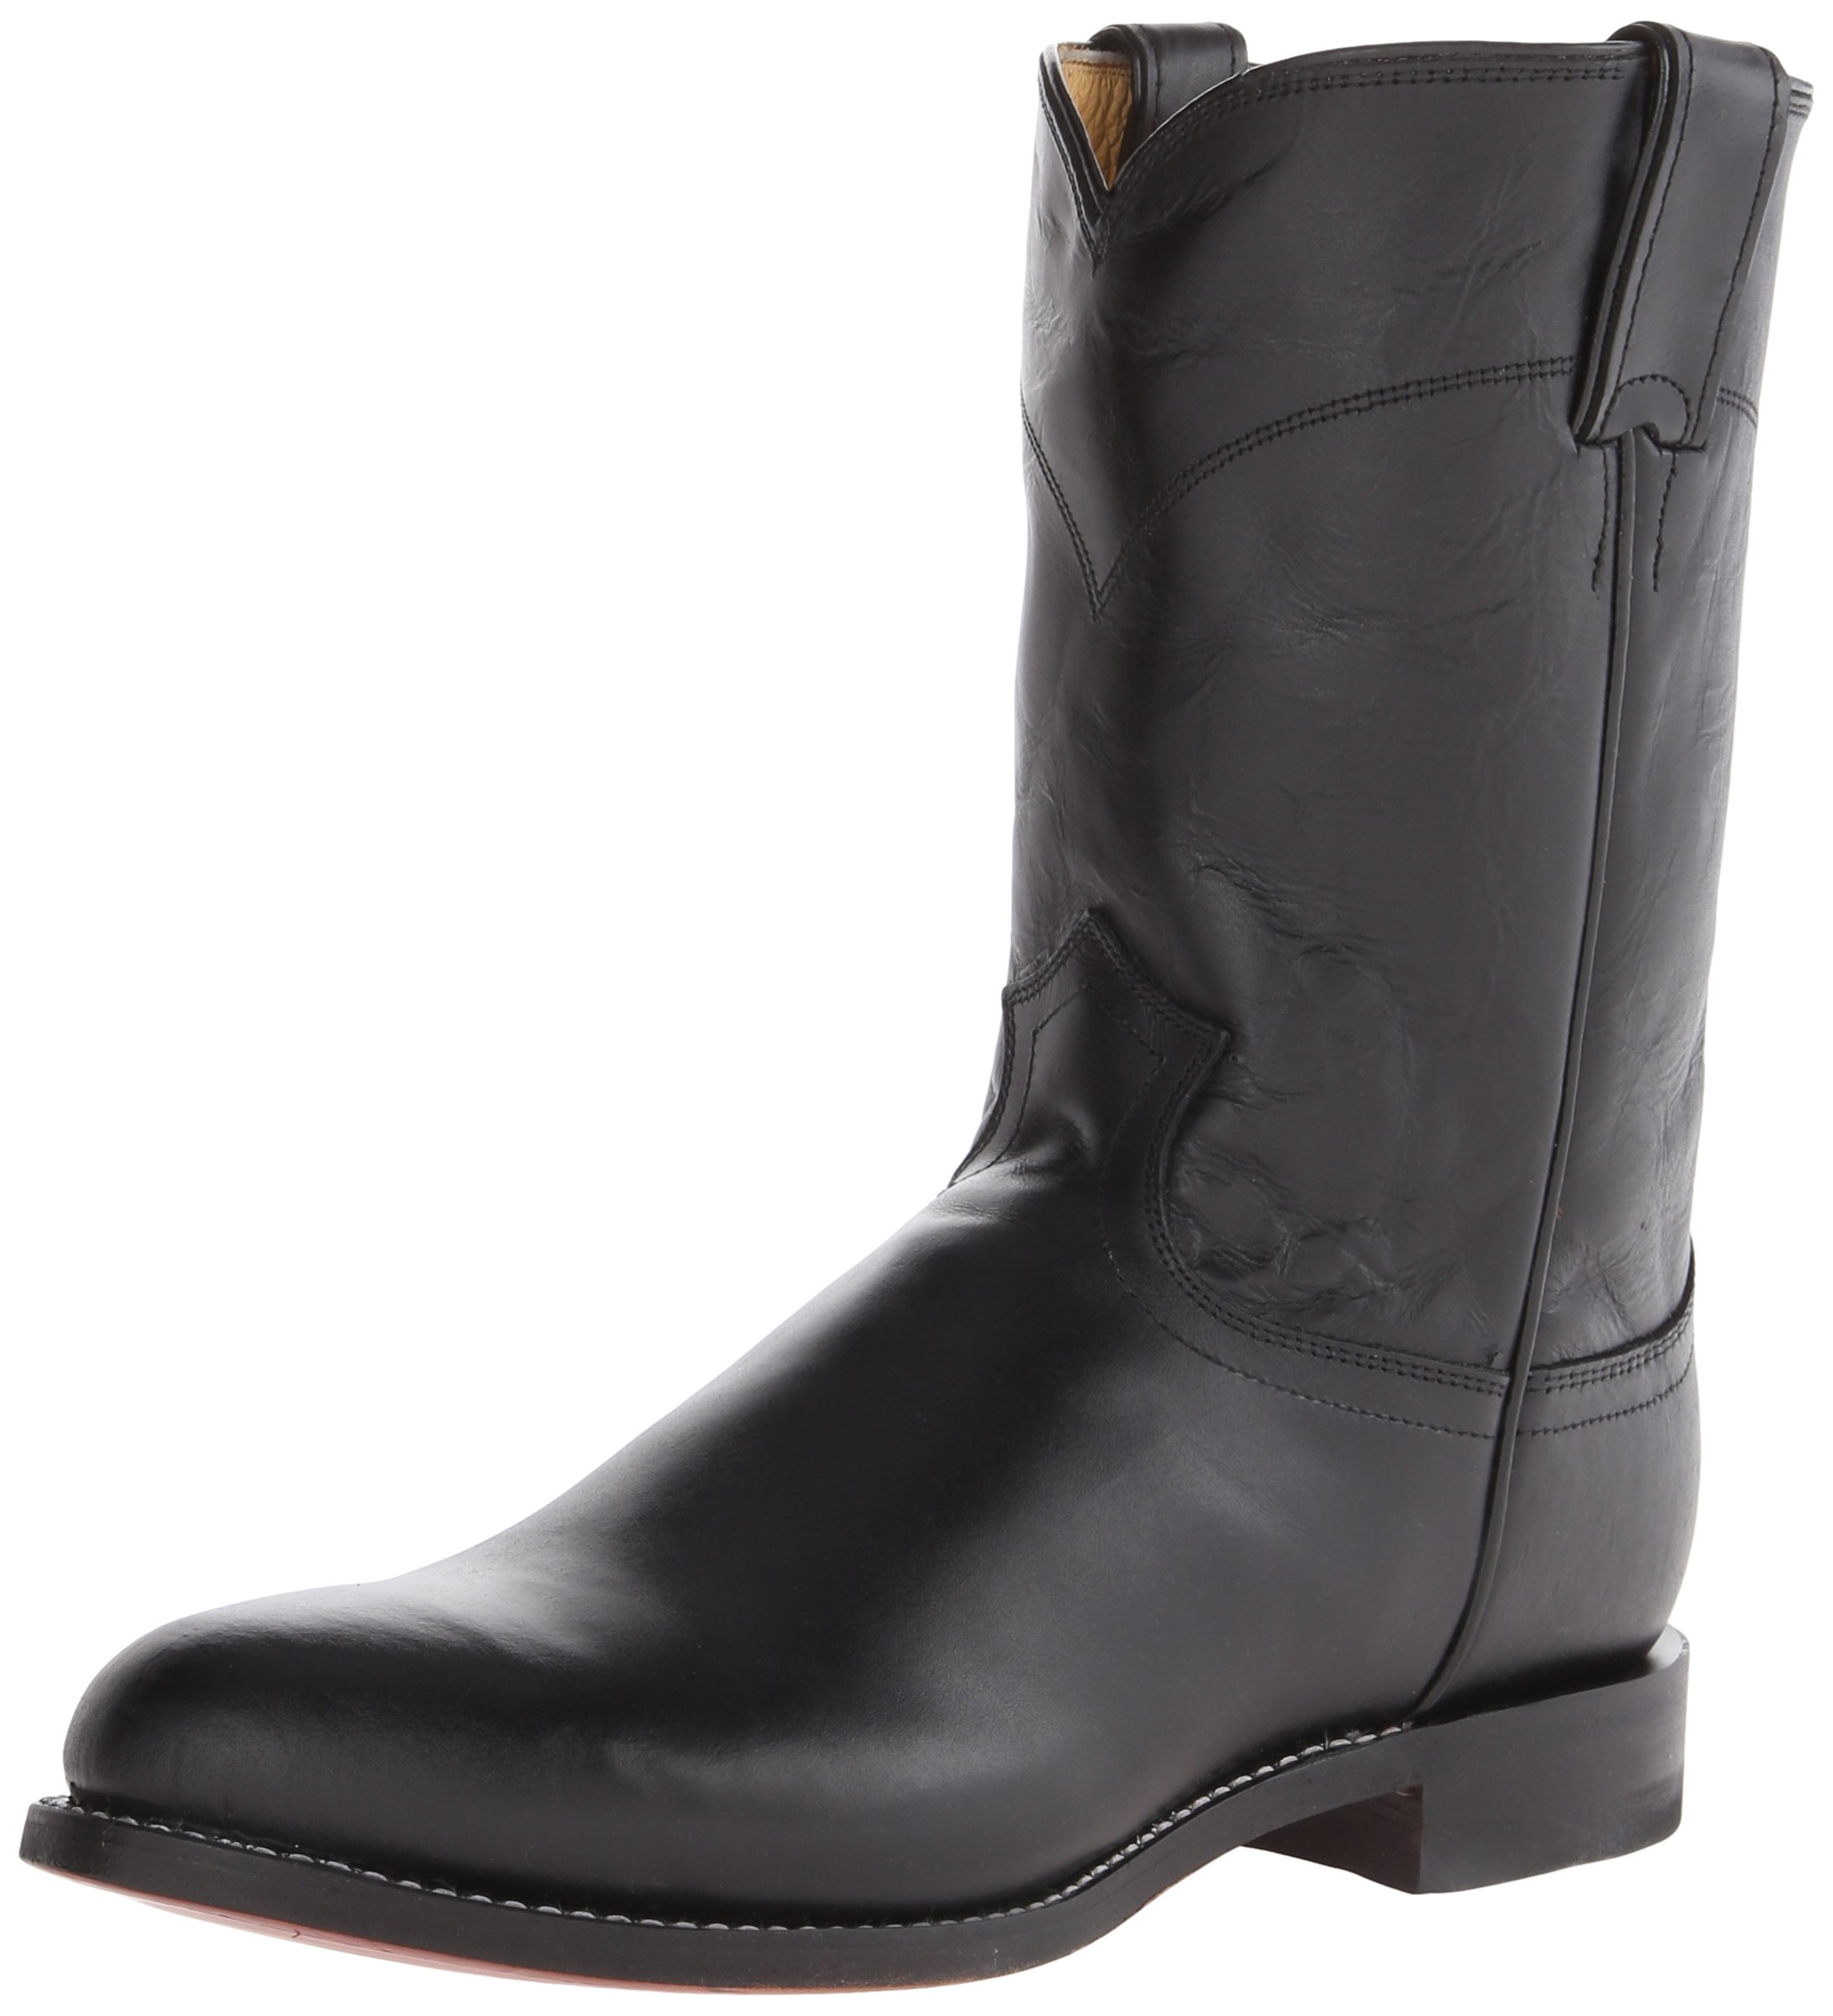 Justin Boots Men's Western Roper Boot,Black Kipskin,9 D US